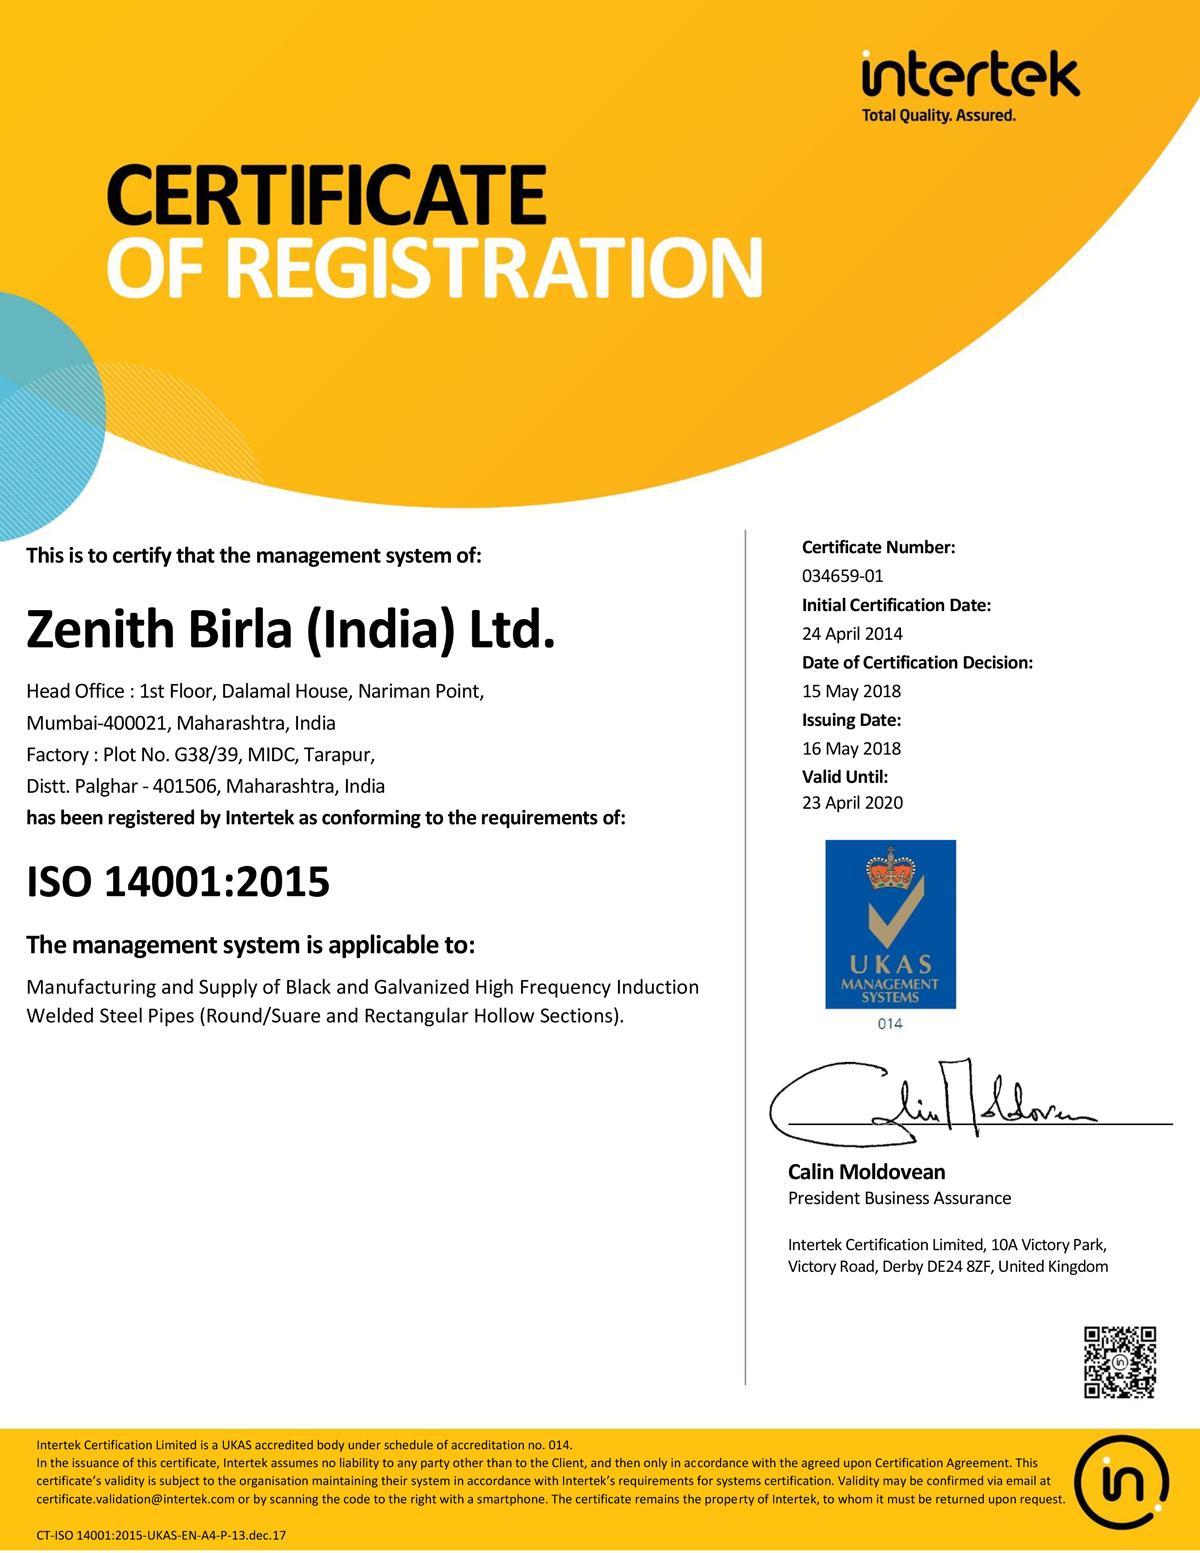 Zenith Birla (India) Limited